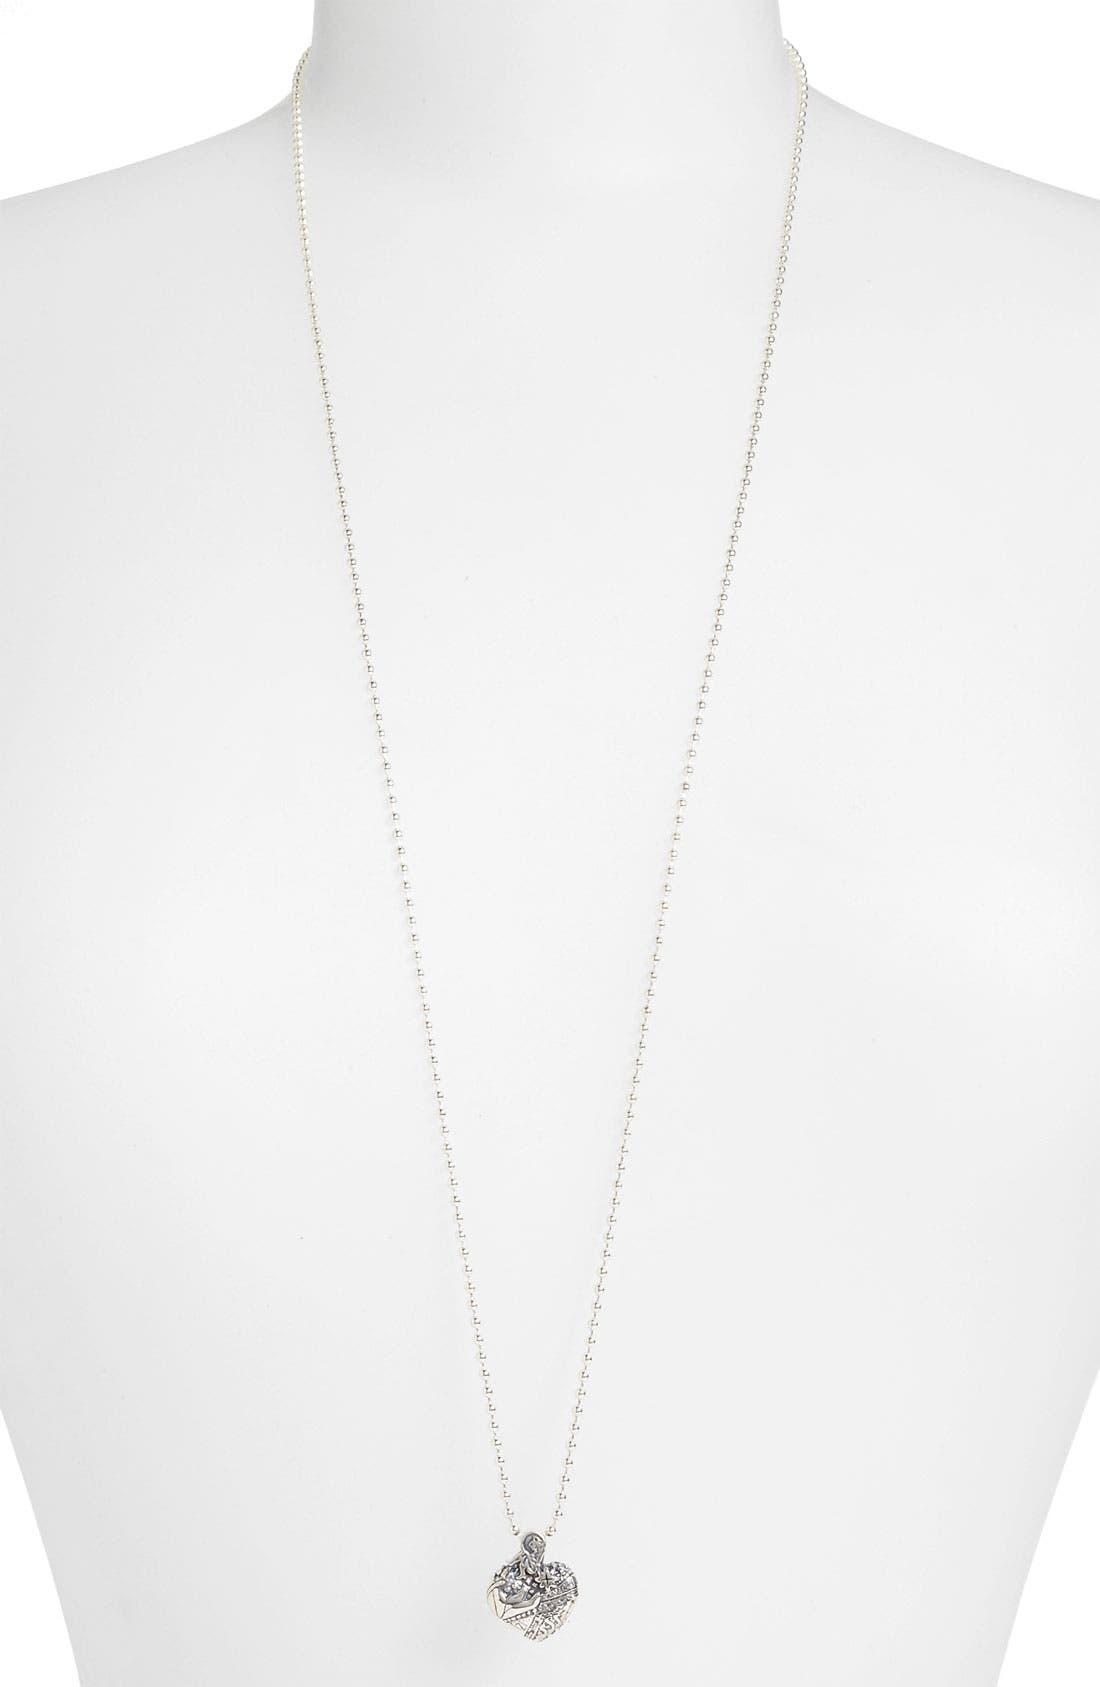 'Hearts of LAGOS - Las Vegas' Reversible Pendant Necklace,                             Alternate thumbnail 2, color,                             Heart Of Las Vegas